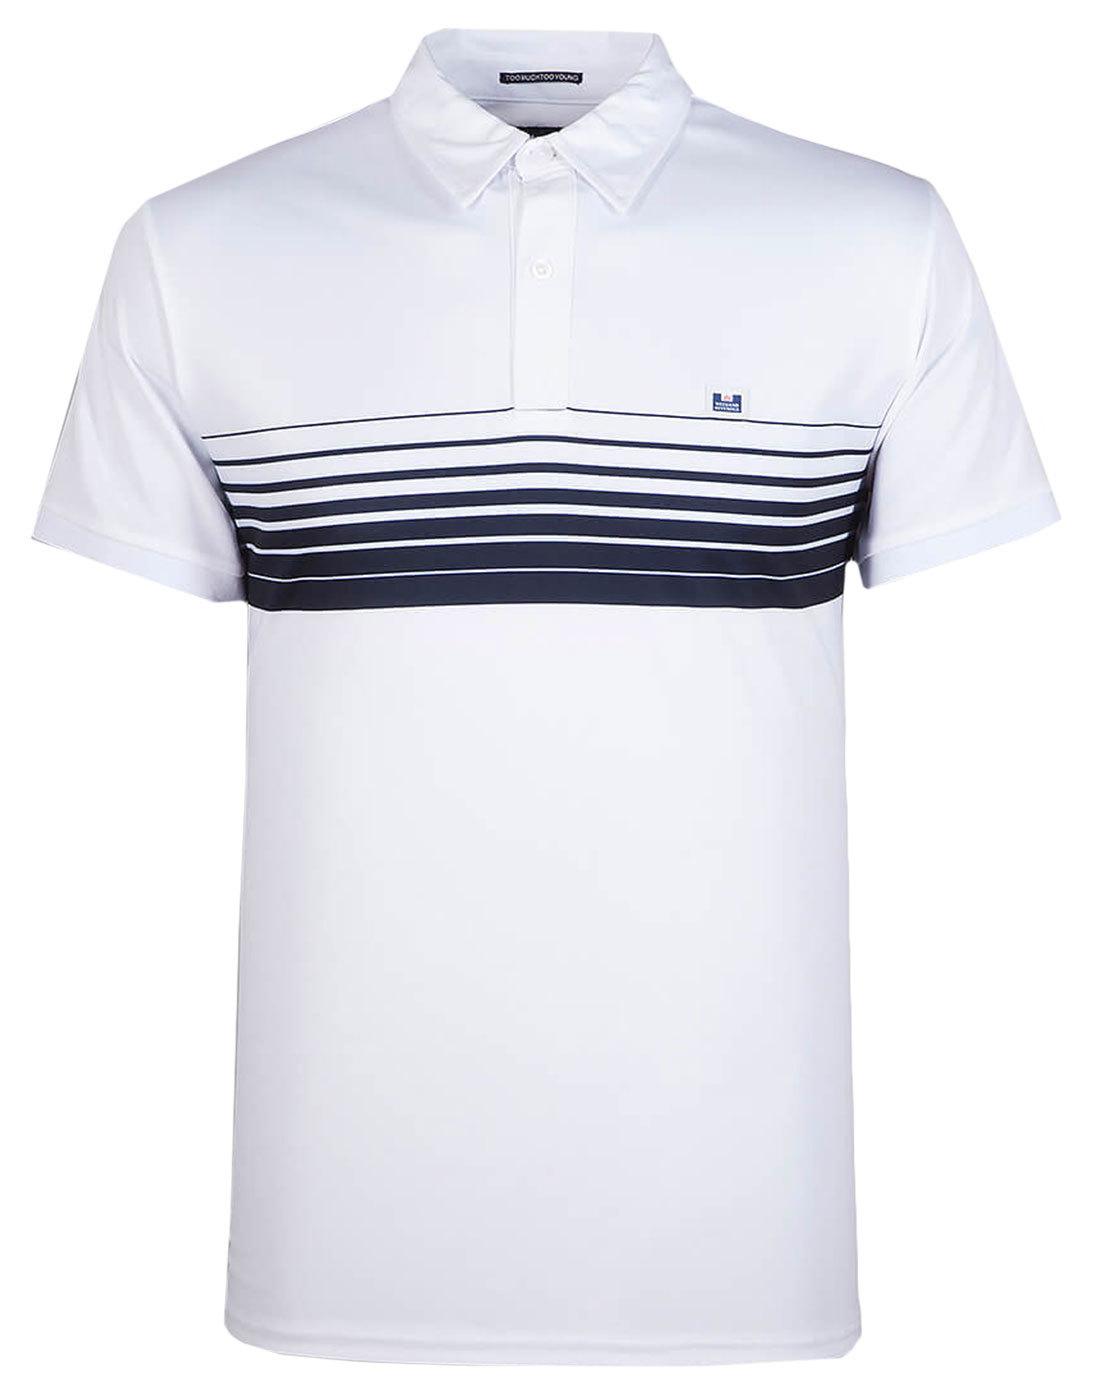 Batida WEEKEND OFFENDER Men's Retro Mod Polo Shirt